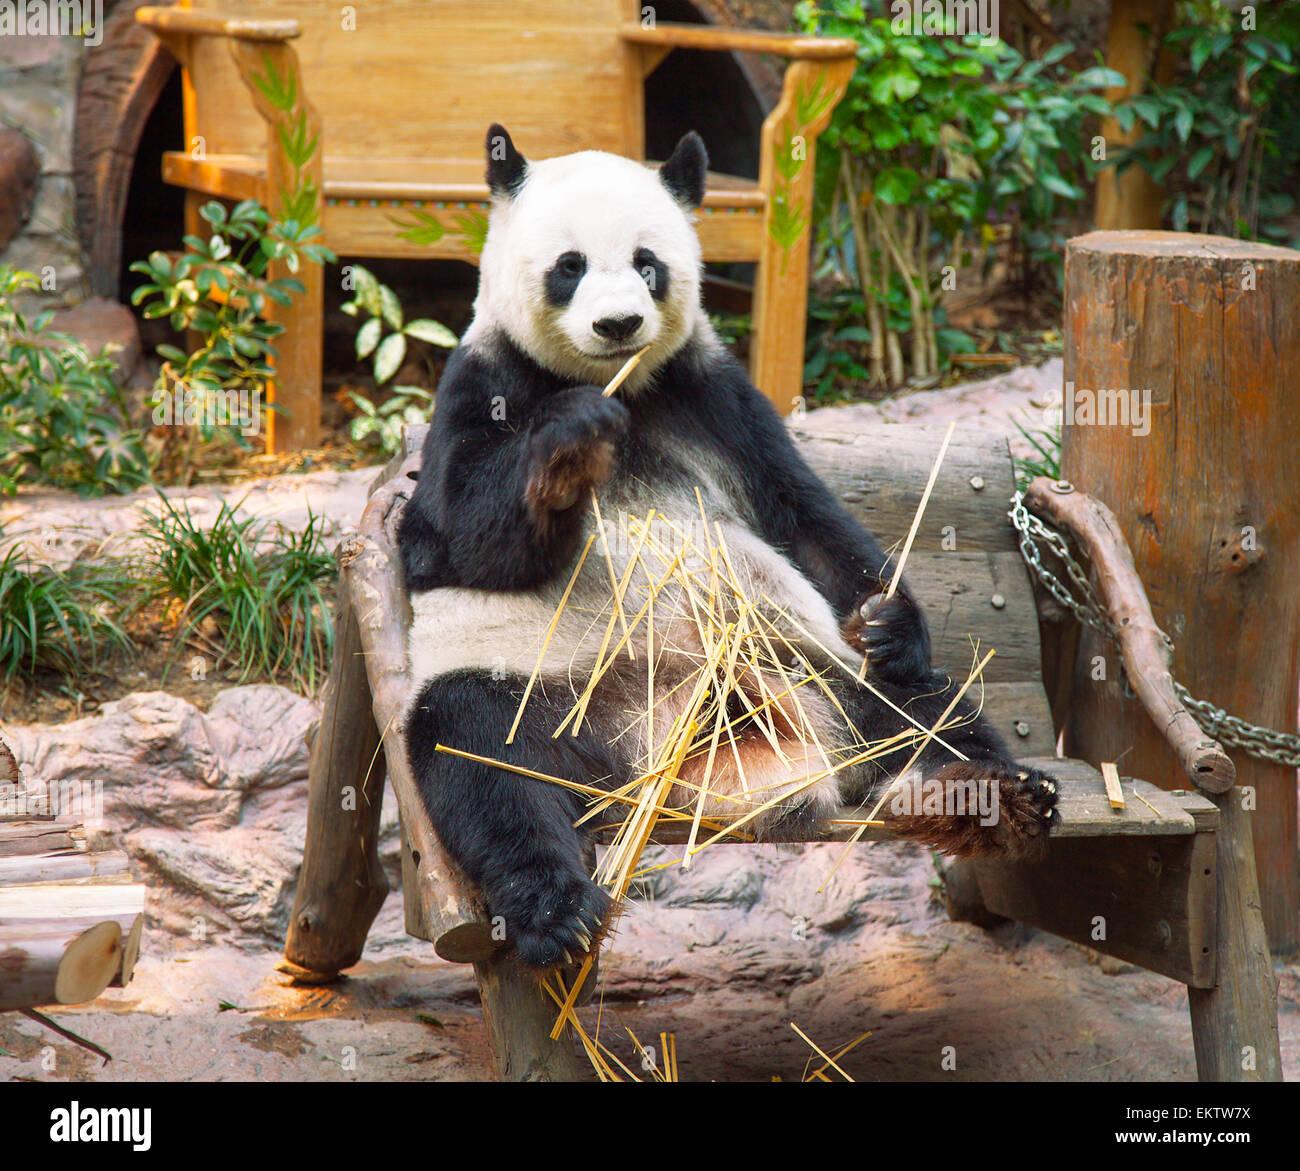 Ours panda géant manger bambou dans Chiang Mai Zoo, Thaïlande Photo Stock